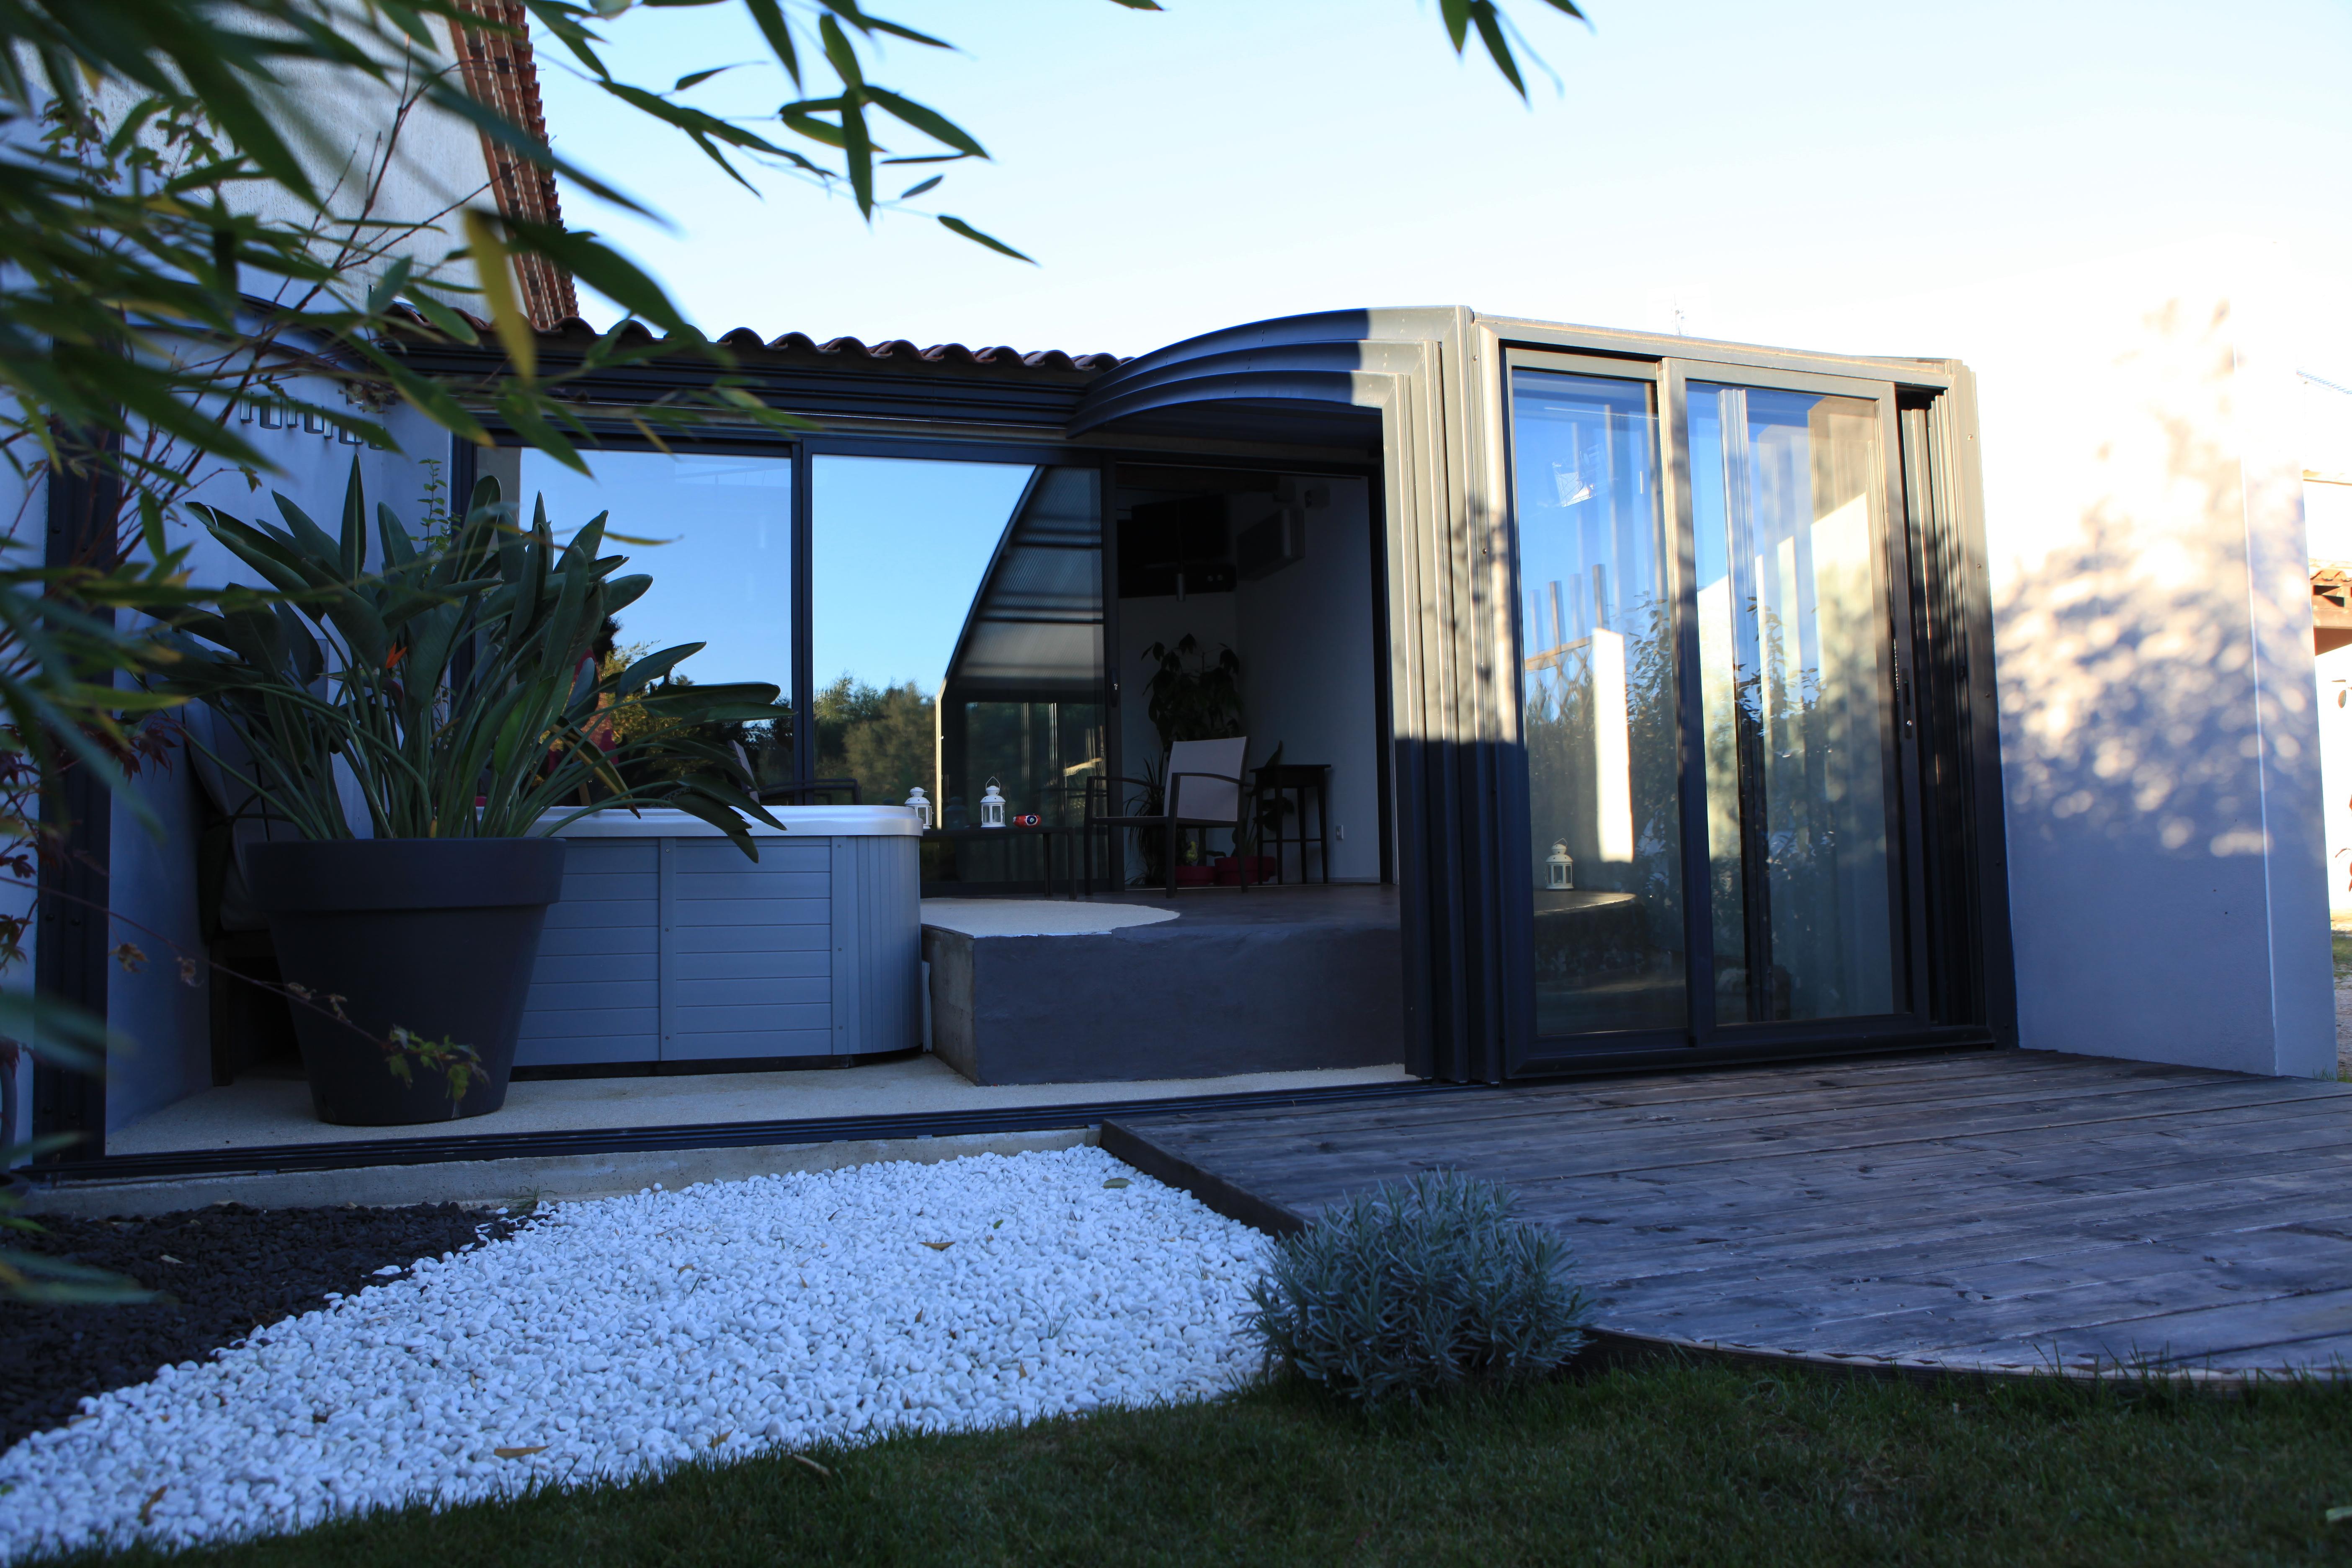 Abri Terrasse Fixe Et Coulissant | Fabricant Azenco concernant Abri Terrasse Coulissant